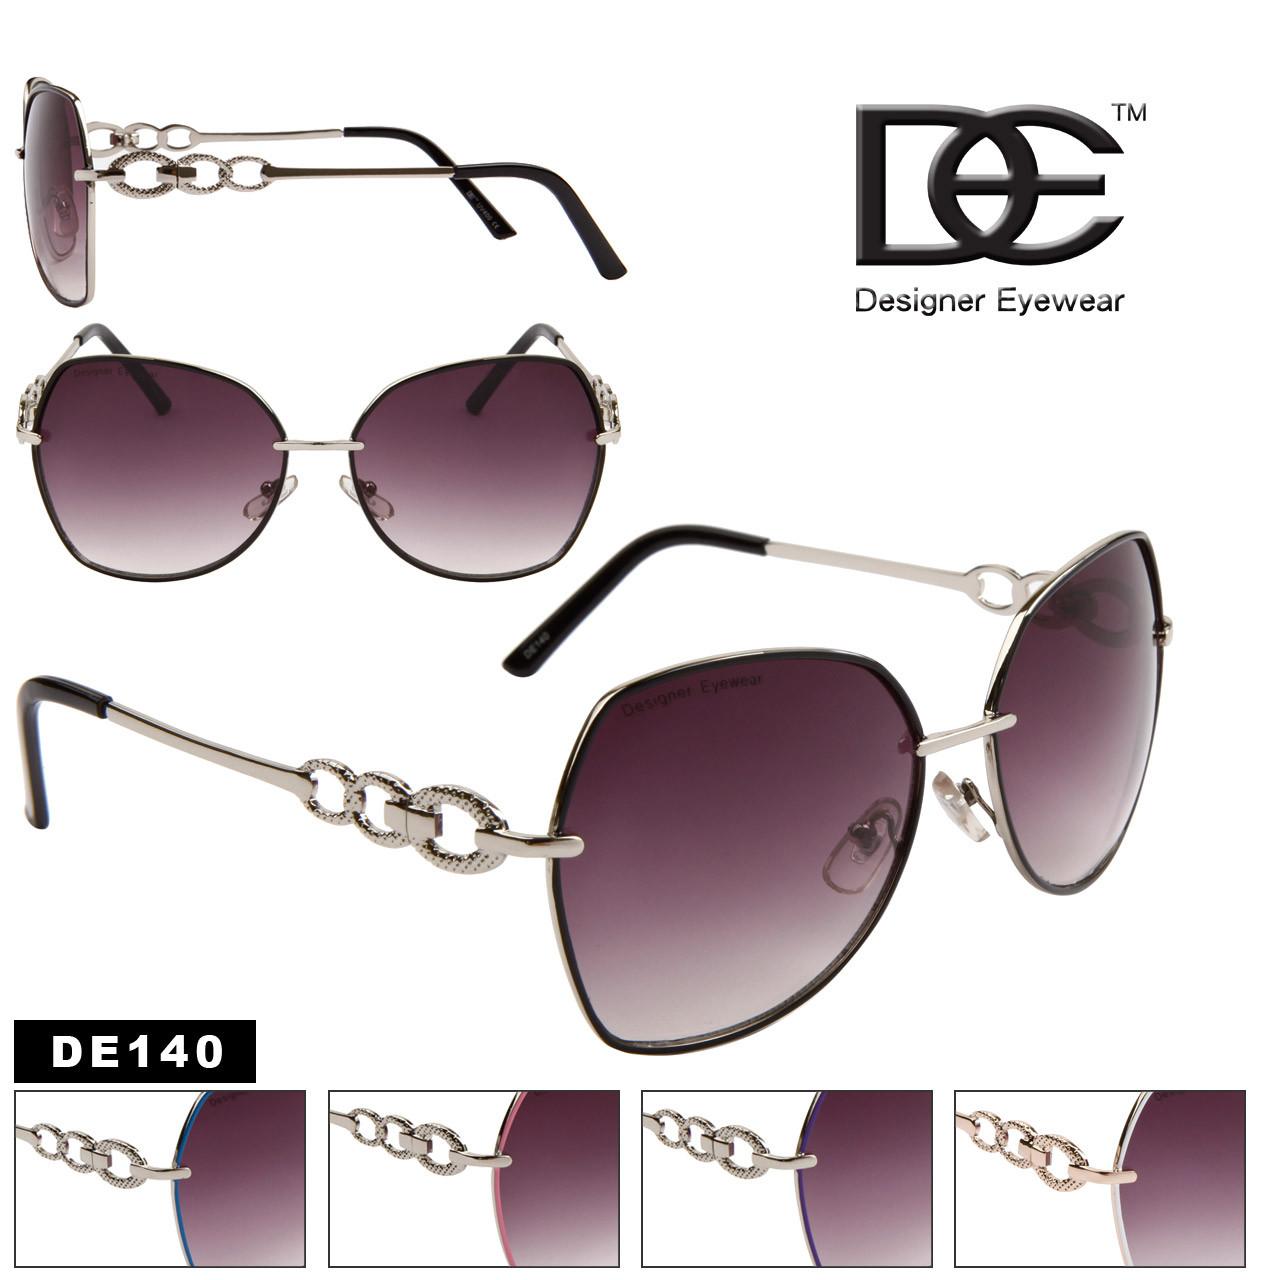 Designer Eyewear Fashion Sunglasses by the Dozen - Style # DE140